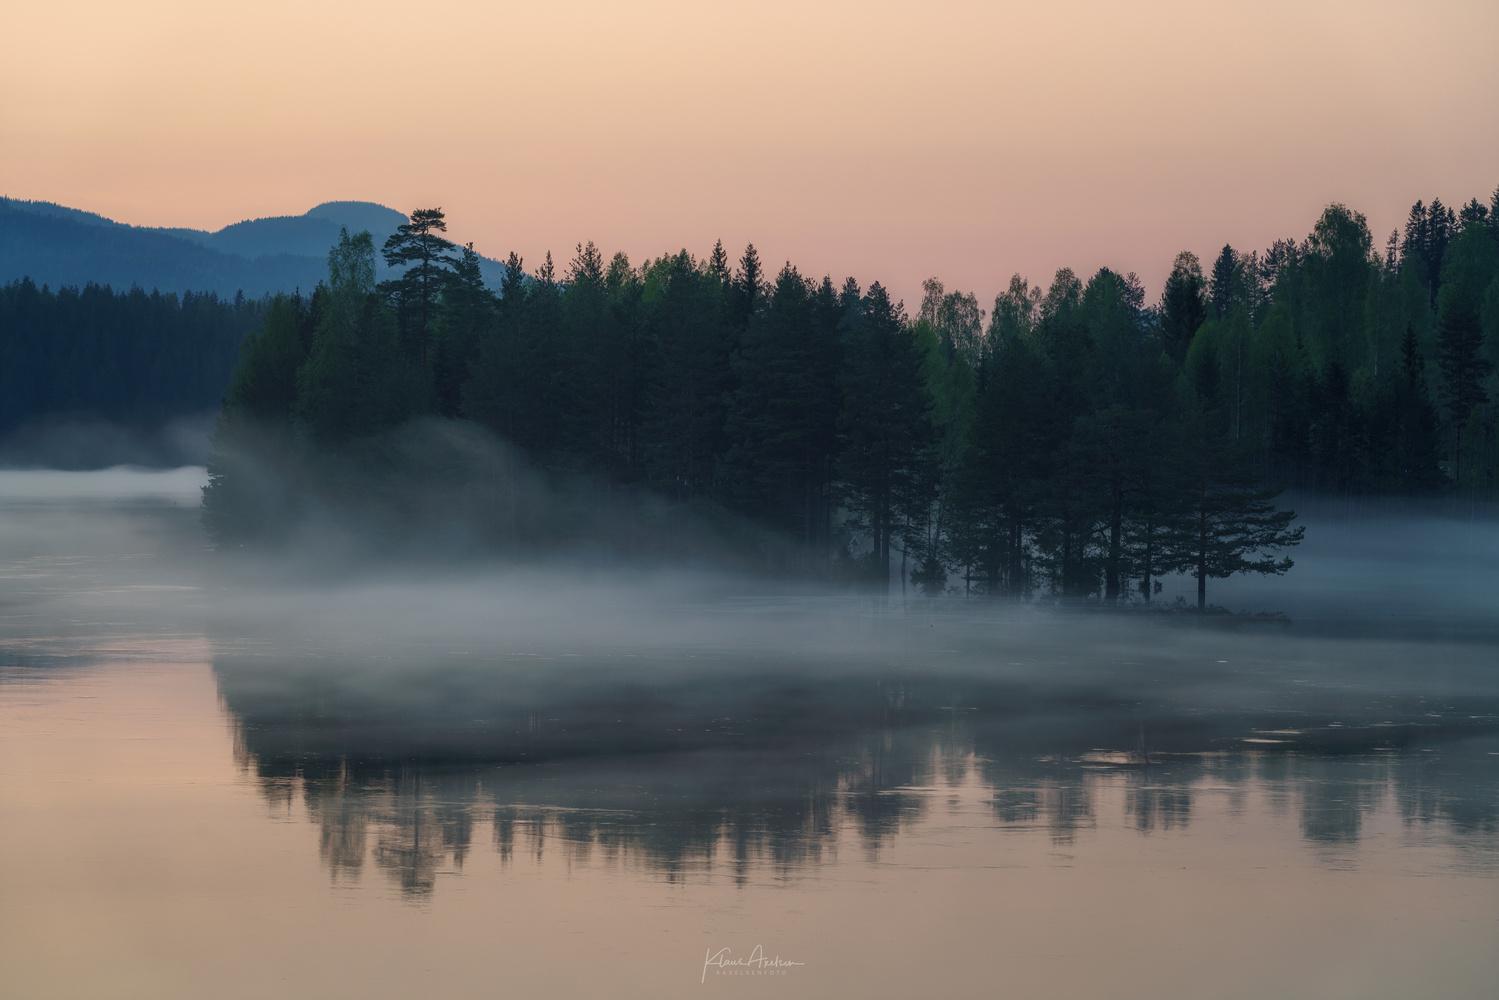 """Evening mist"" by Klaus Axelsen"